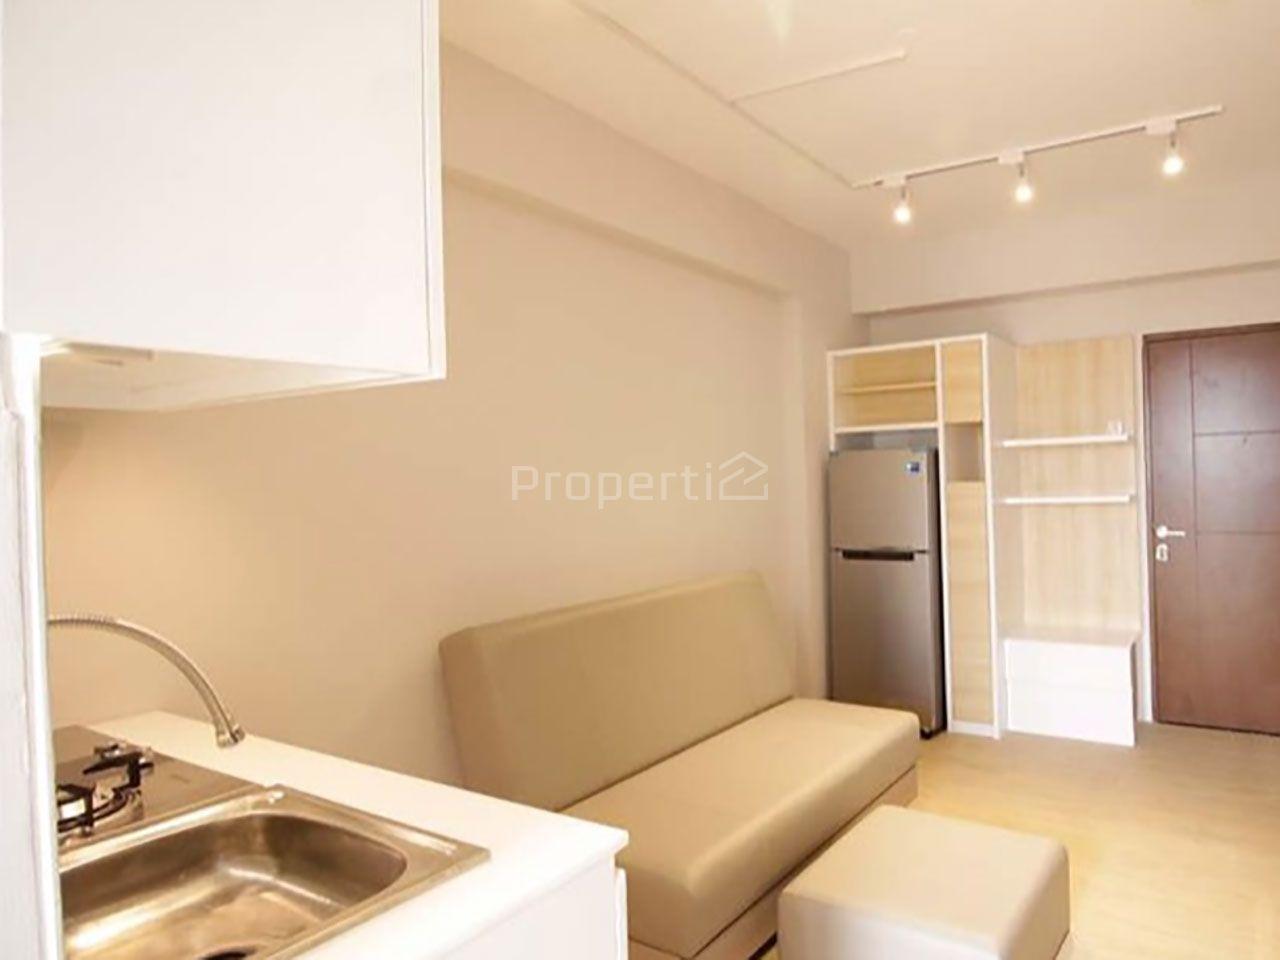 Unit 2BR di Apartemen Gateway Bandung, Jawa Barat